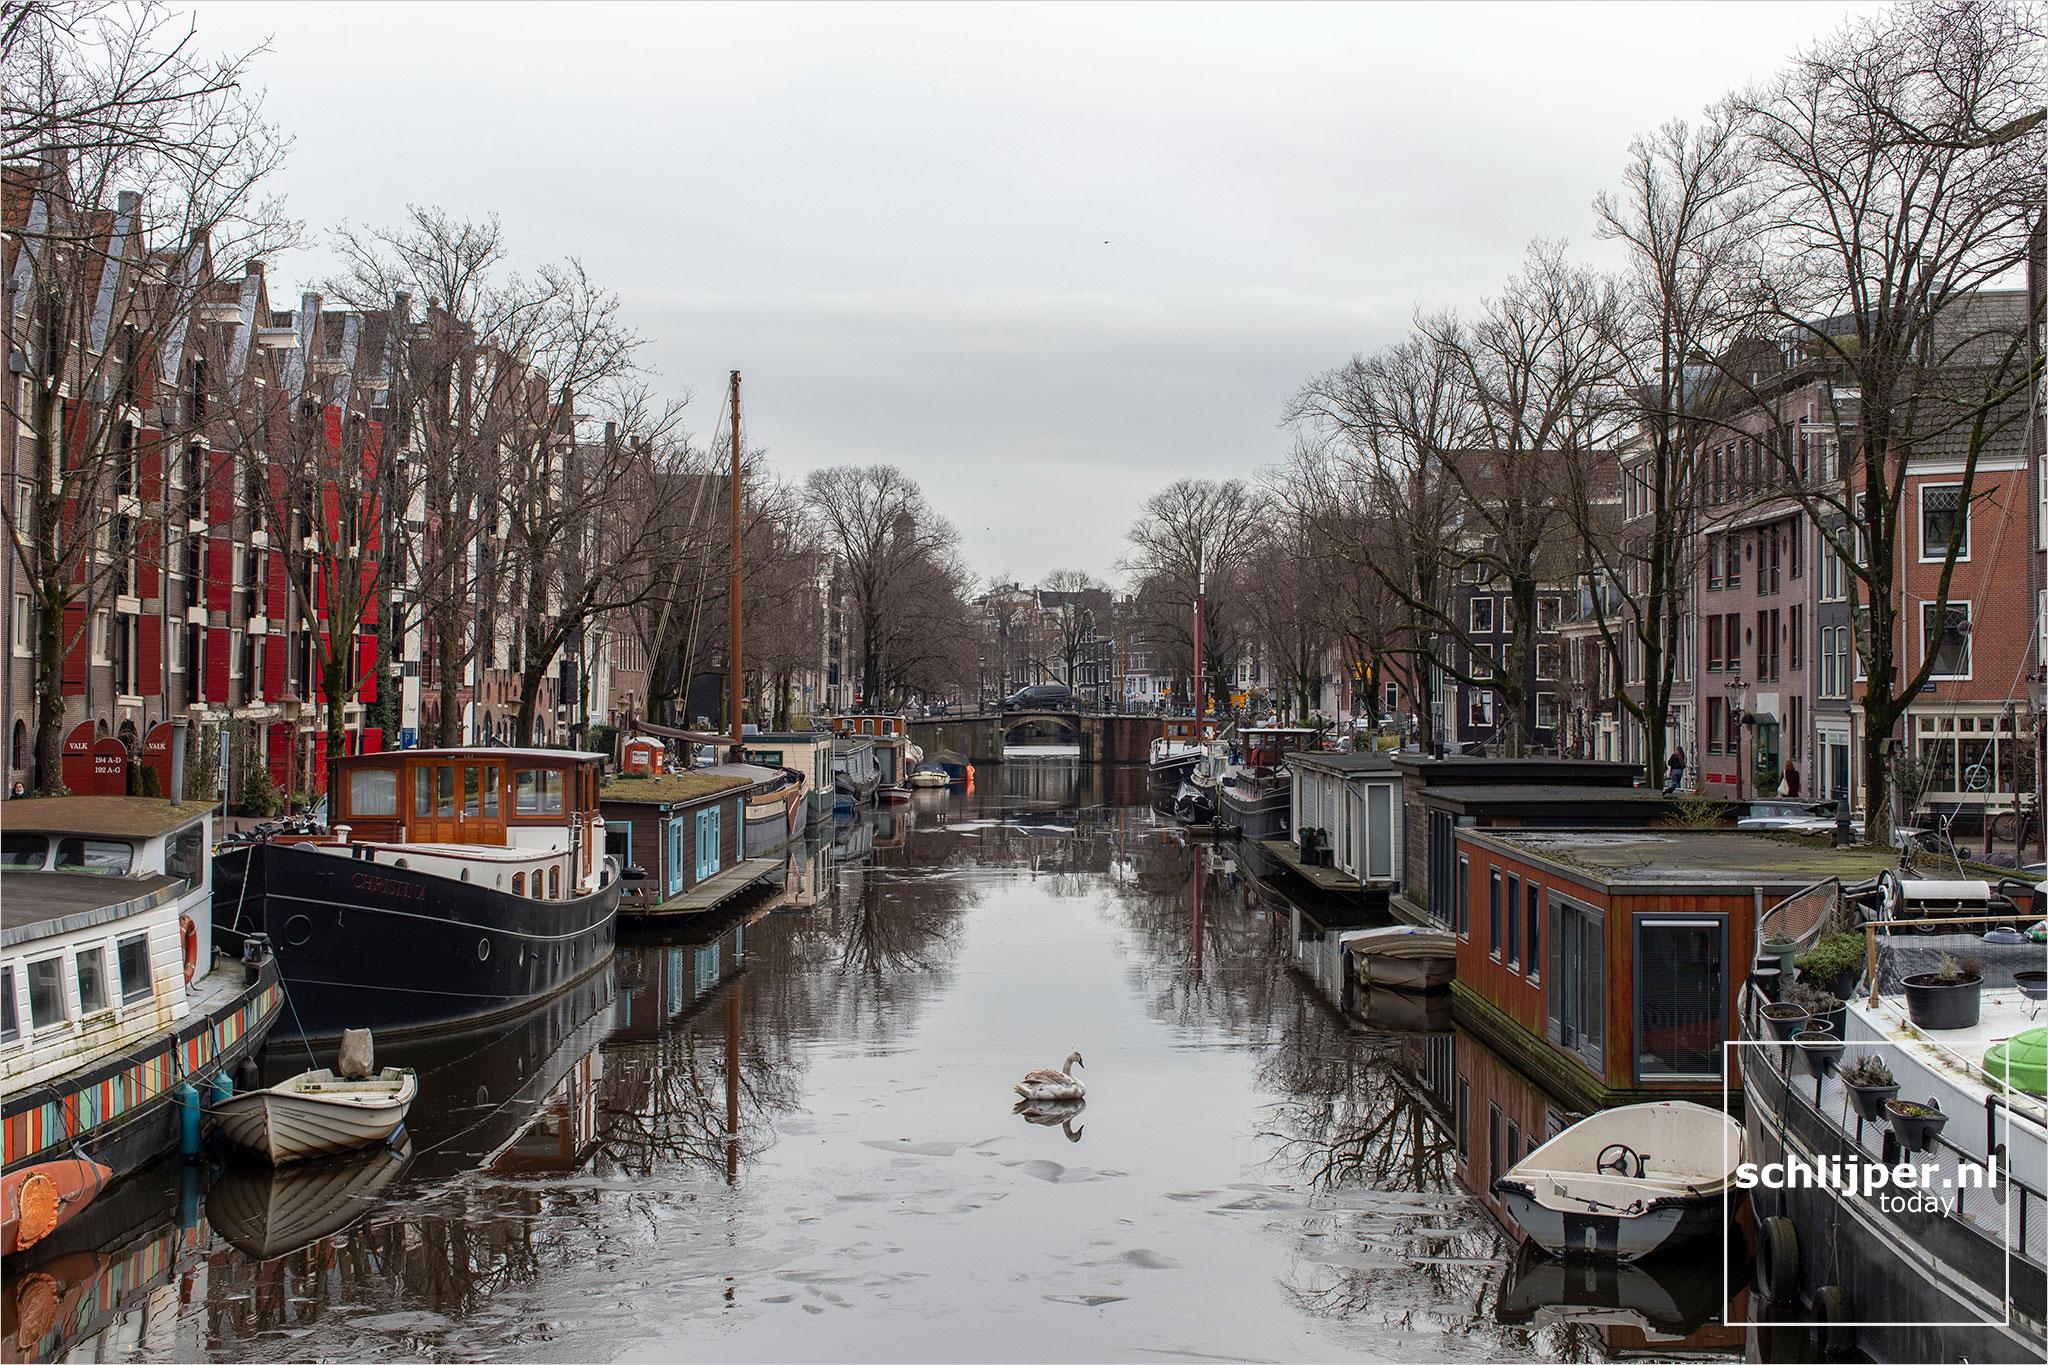 The Netherlands, Amsterdam, 16 februari 2021